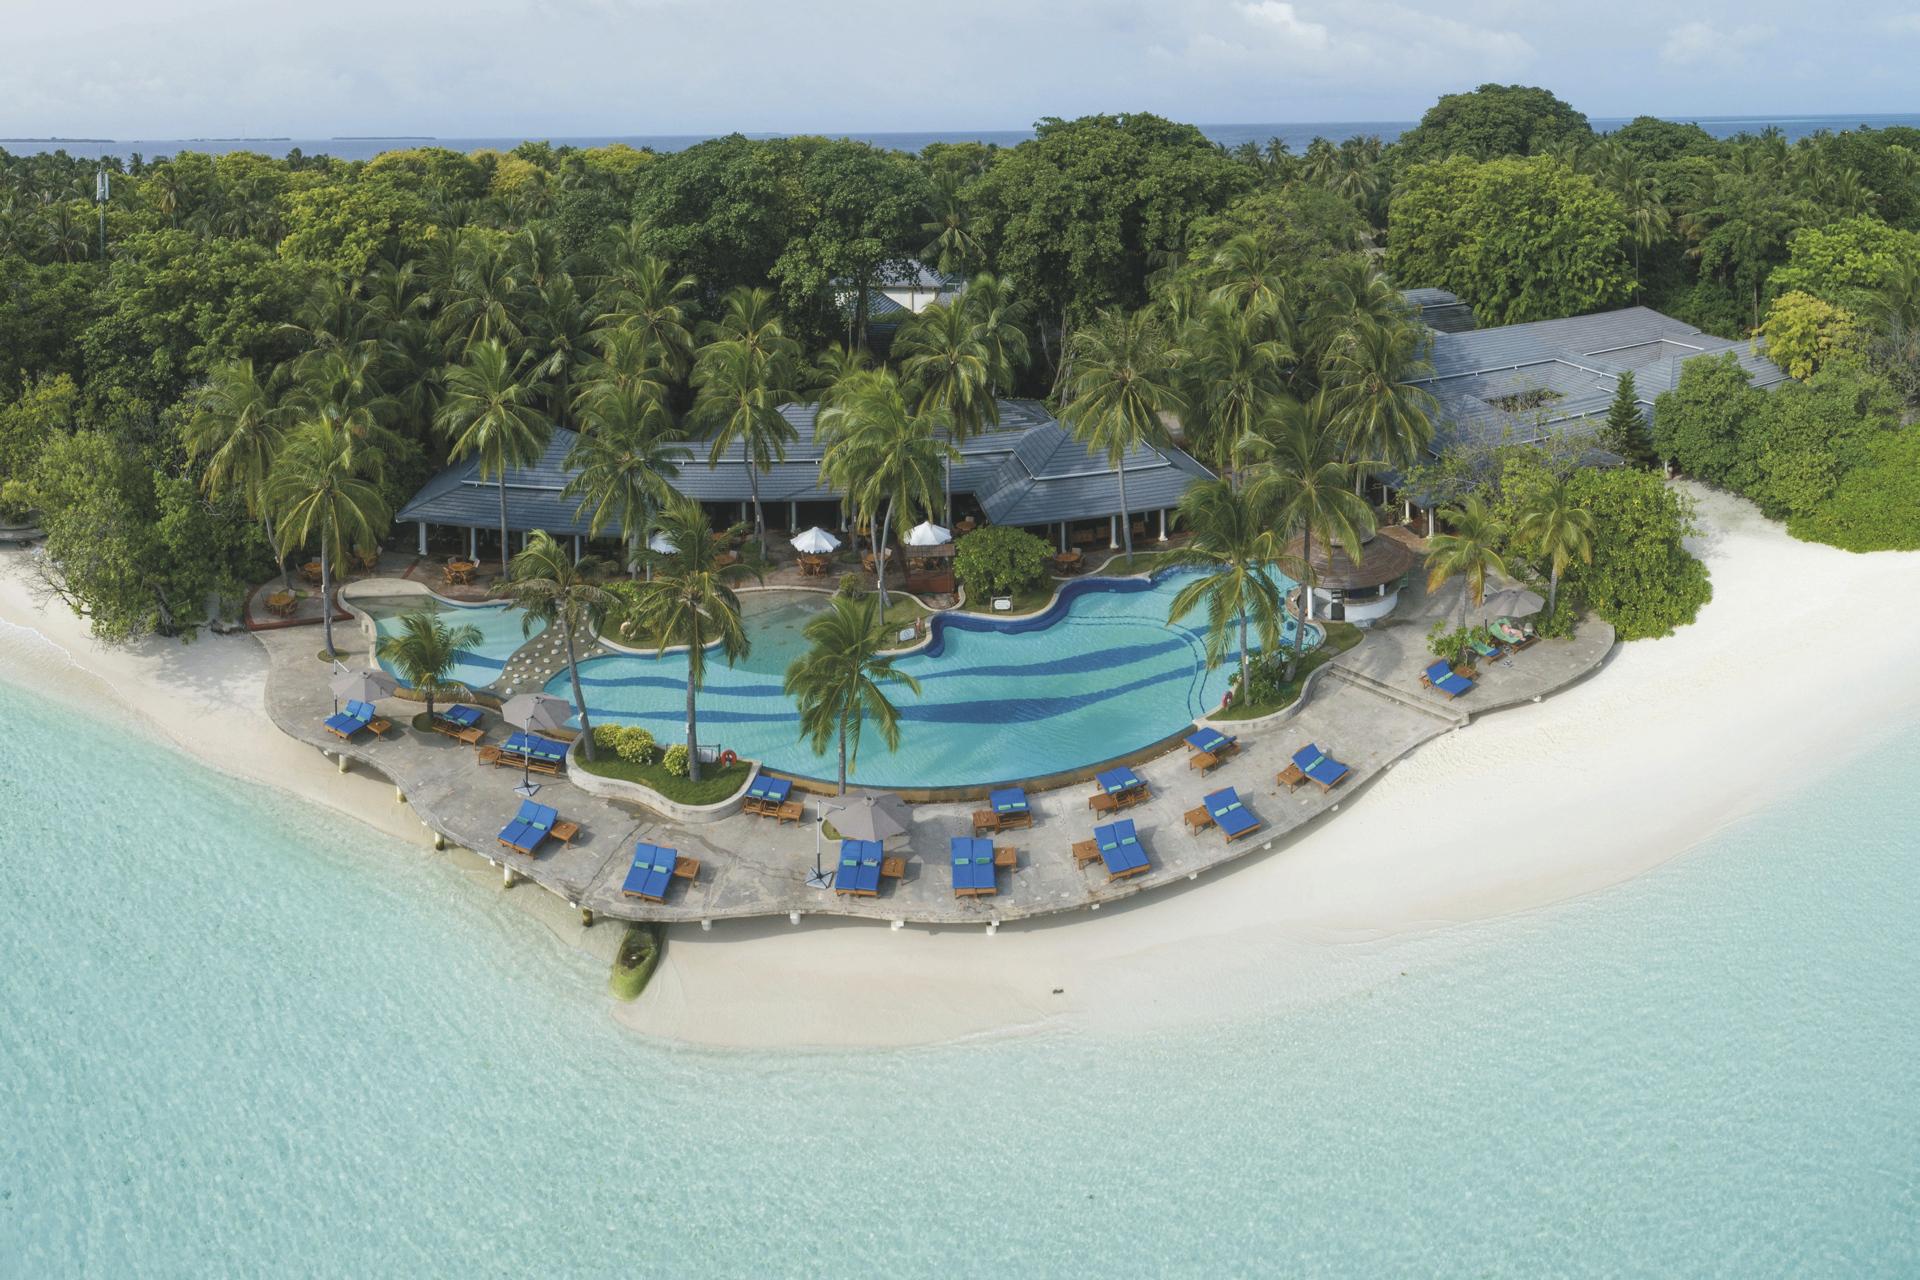 ©Villa Holidays Touristik, Malediven, ©Villa Holidays Touristik, Malediven